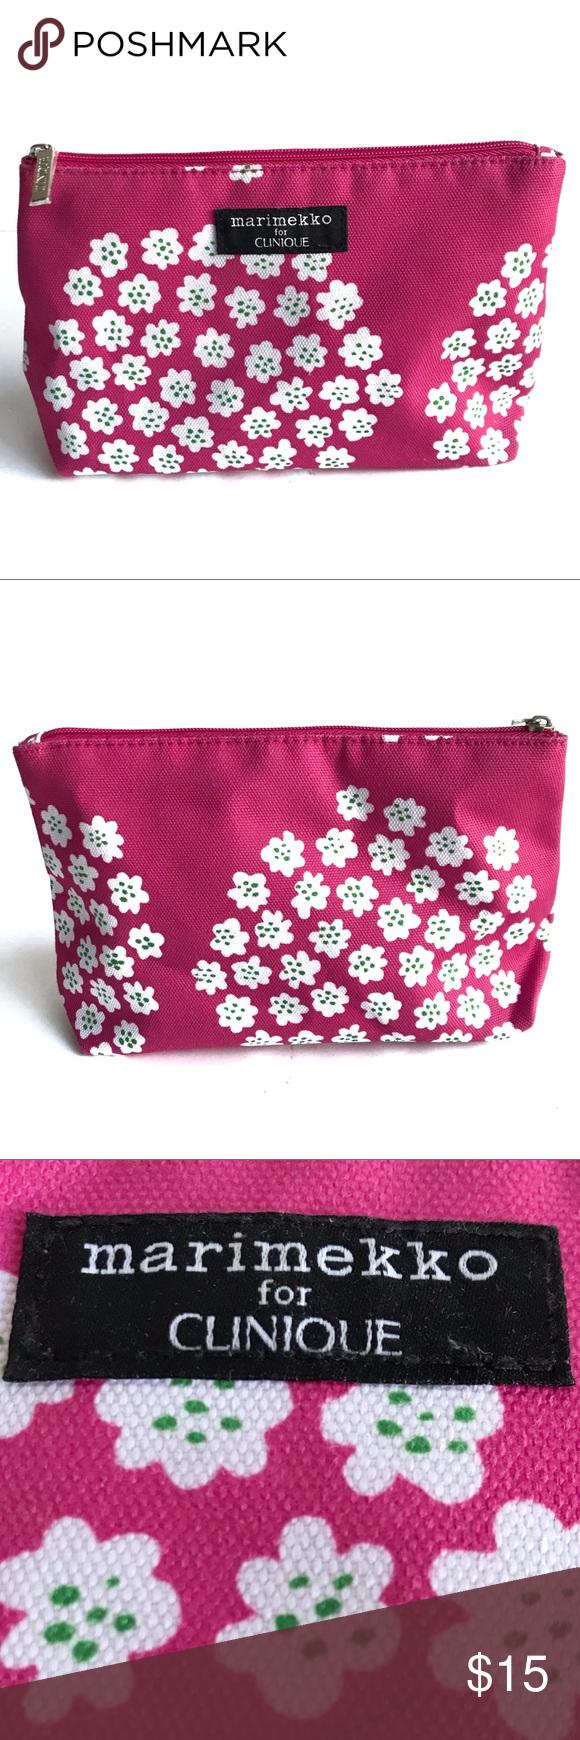 Marimekko X Clinique Pink Floral Makeup Bag Pouch Marimekko For